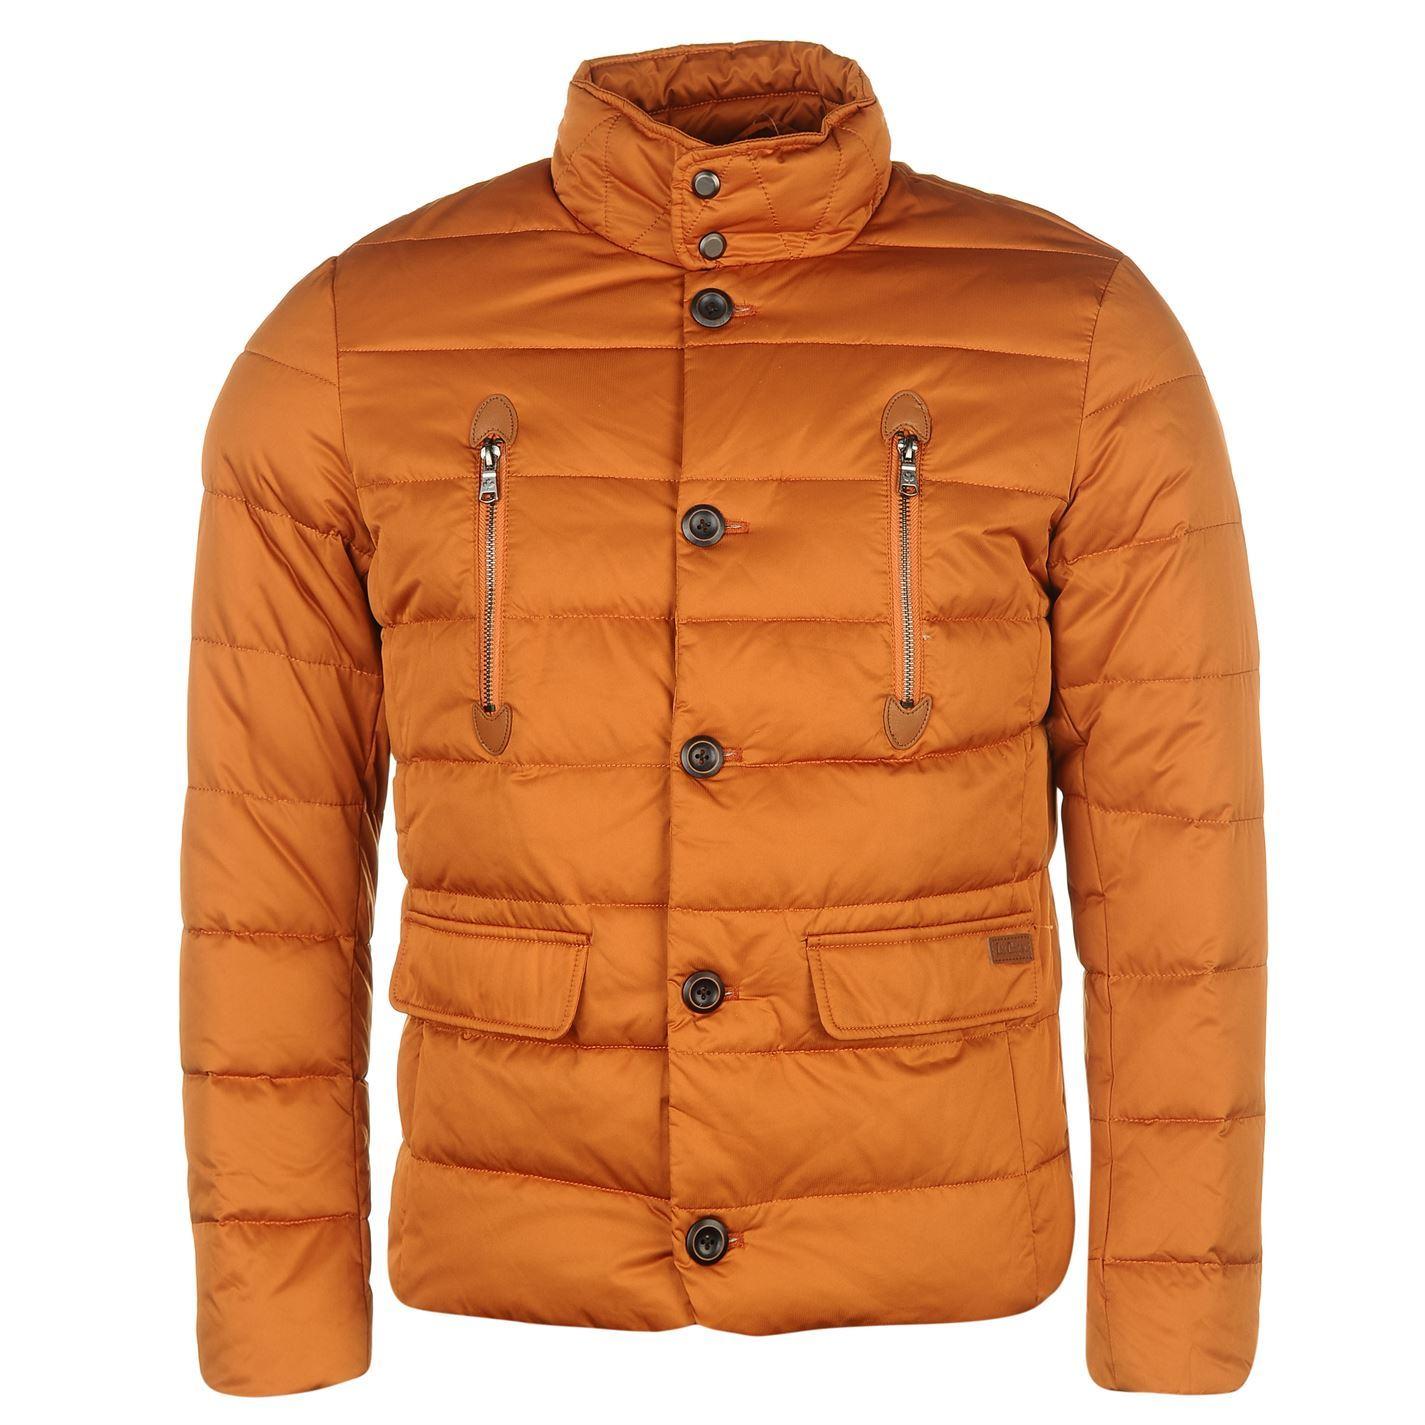 448f89258 Details about Lee Cooper Zip Down Jacket Mens Orange Coat Outerwear